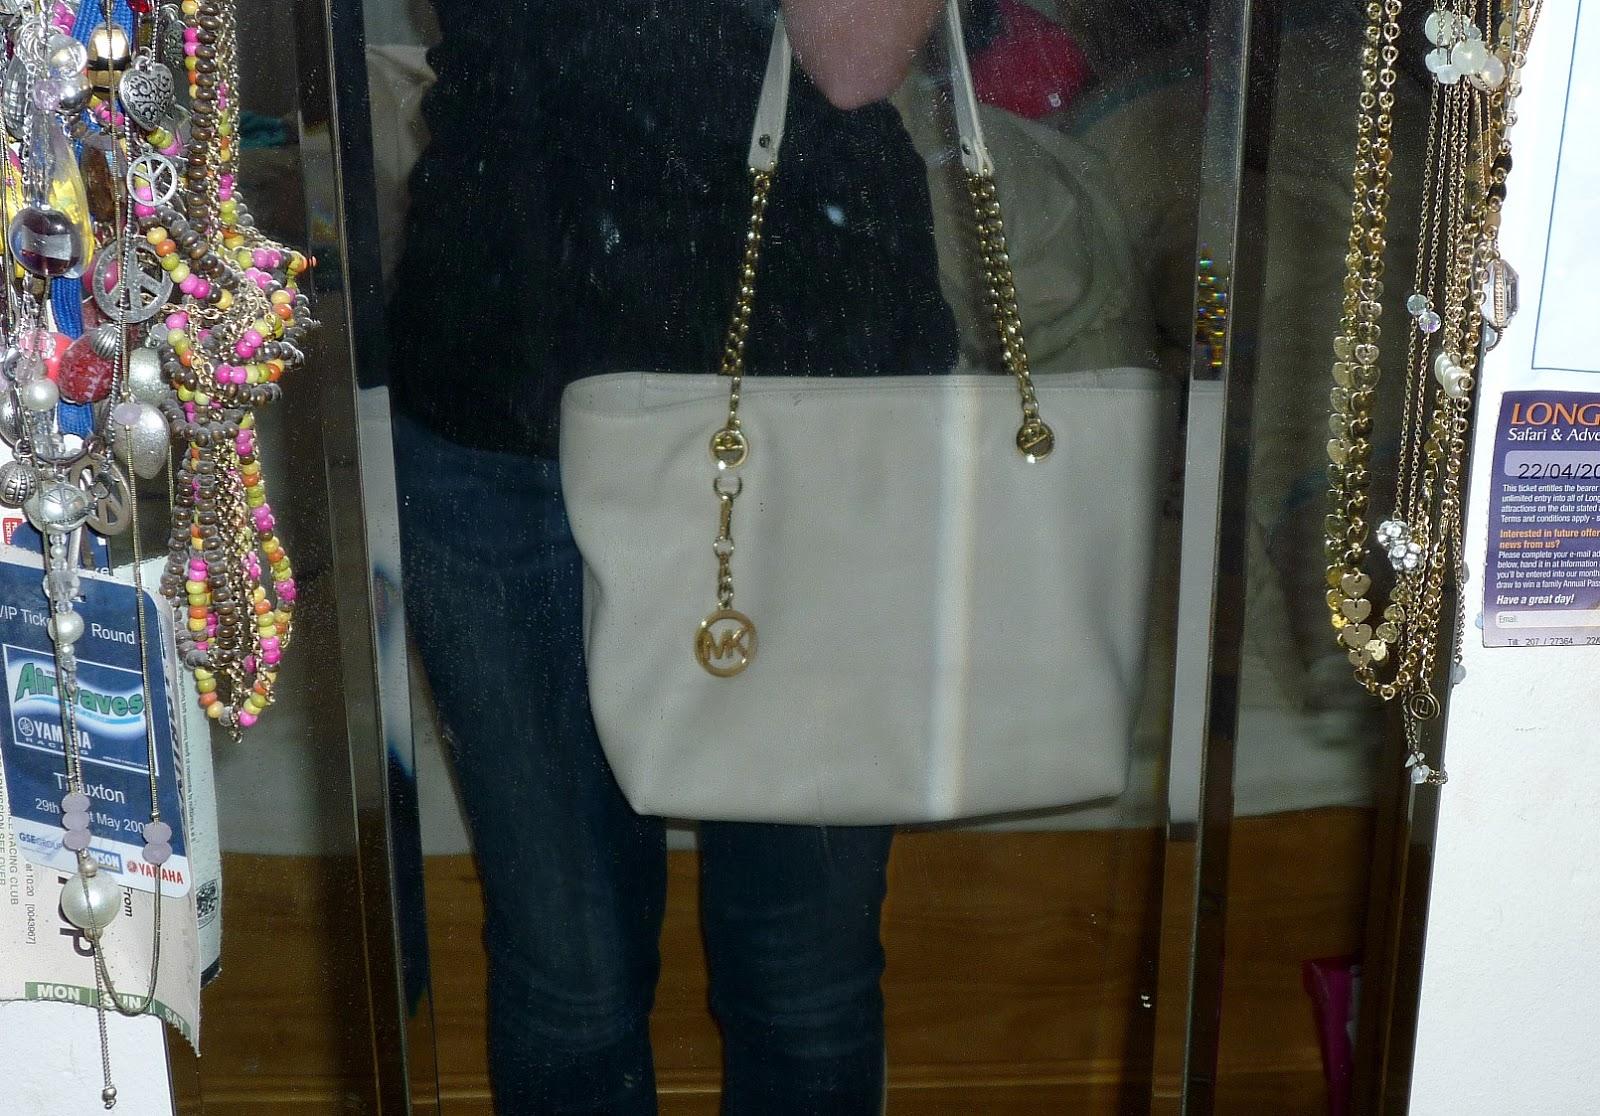 c02e9cec9127 michael kors jet set chain tote east west handbag with tassel ...